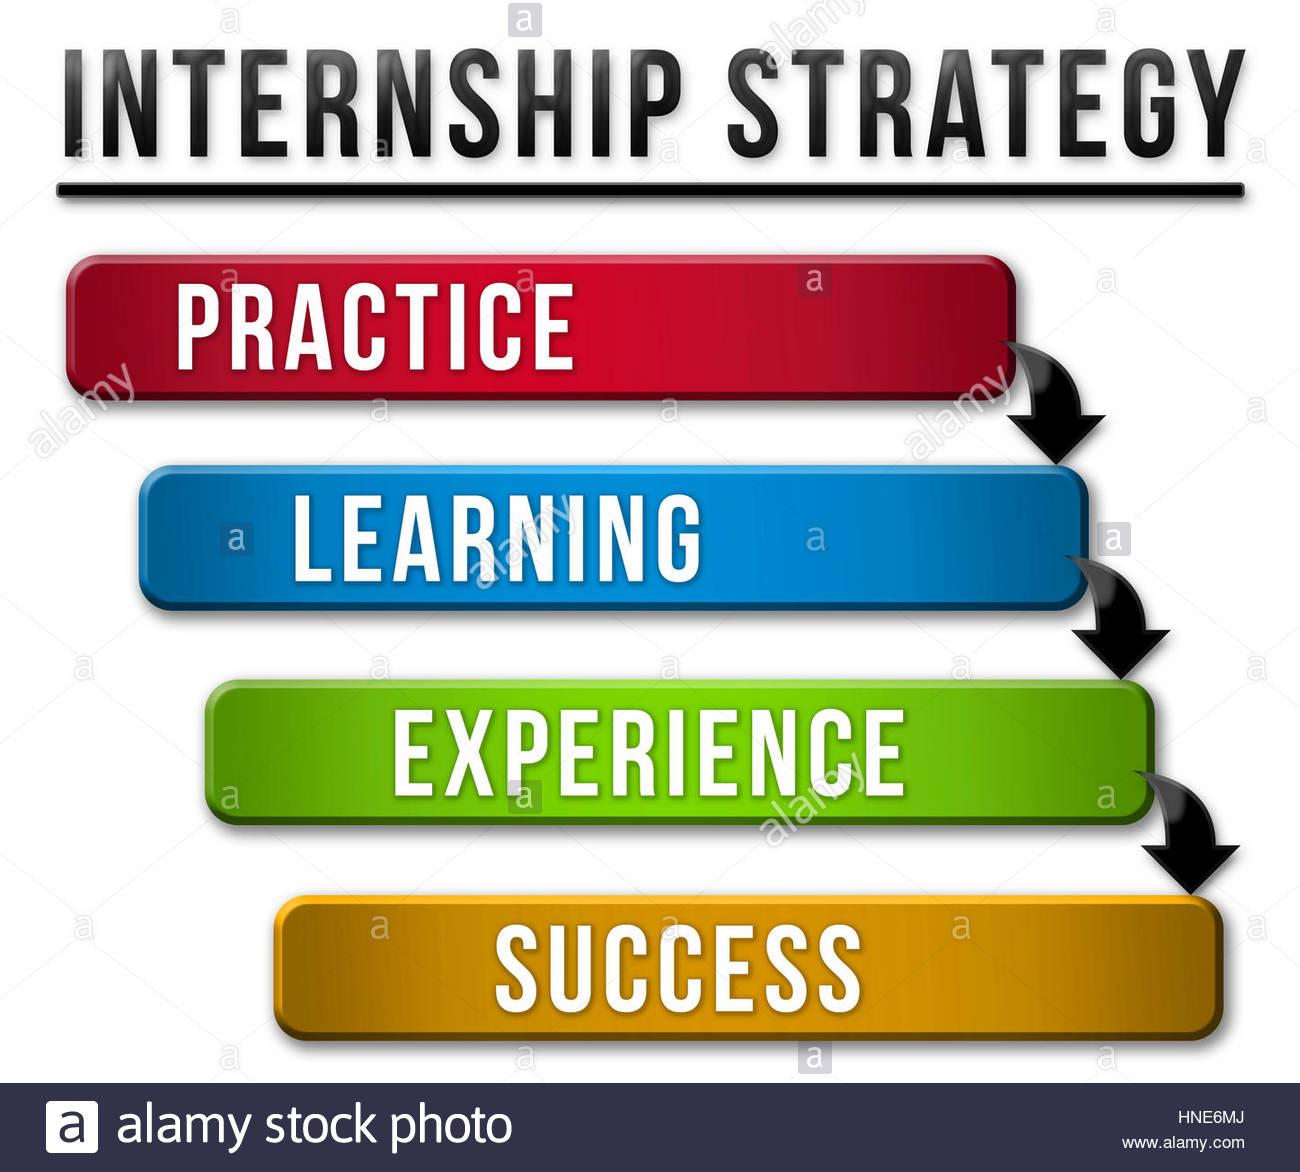 Internship Strategy - Stock Image